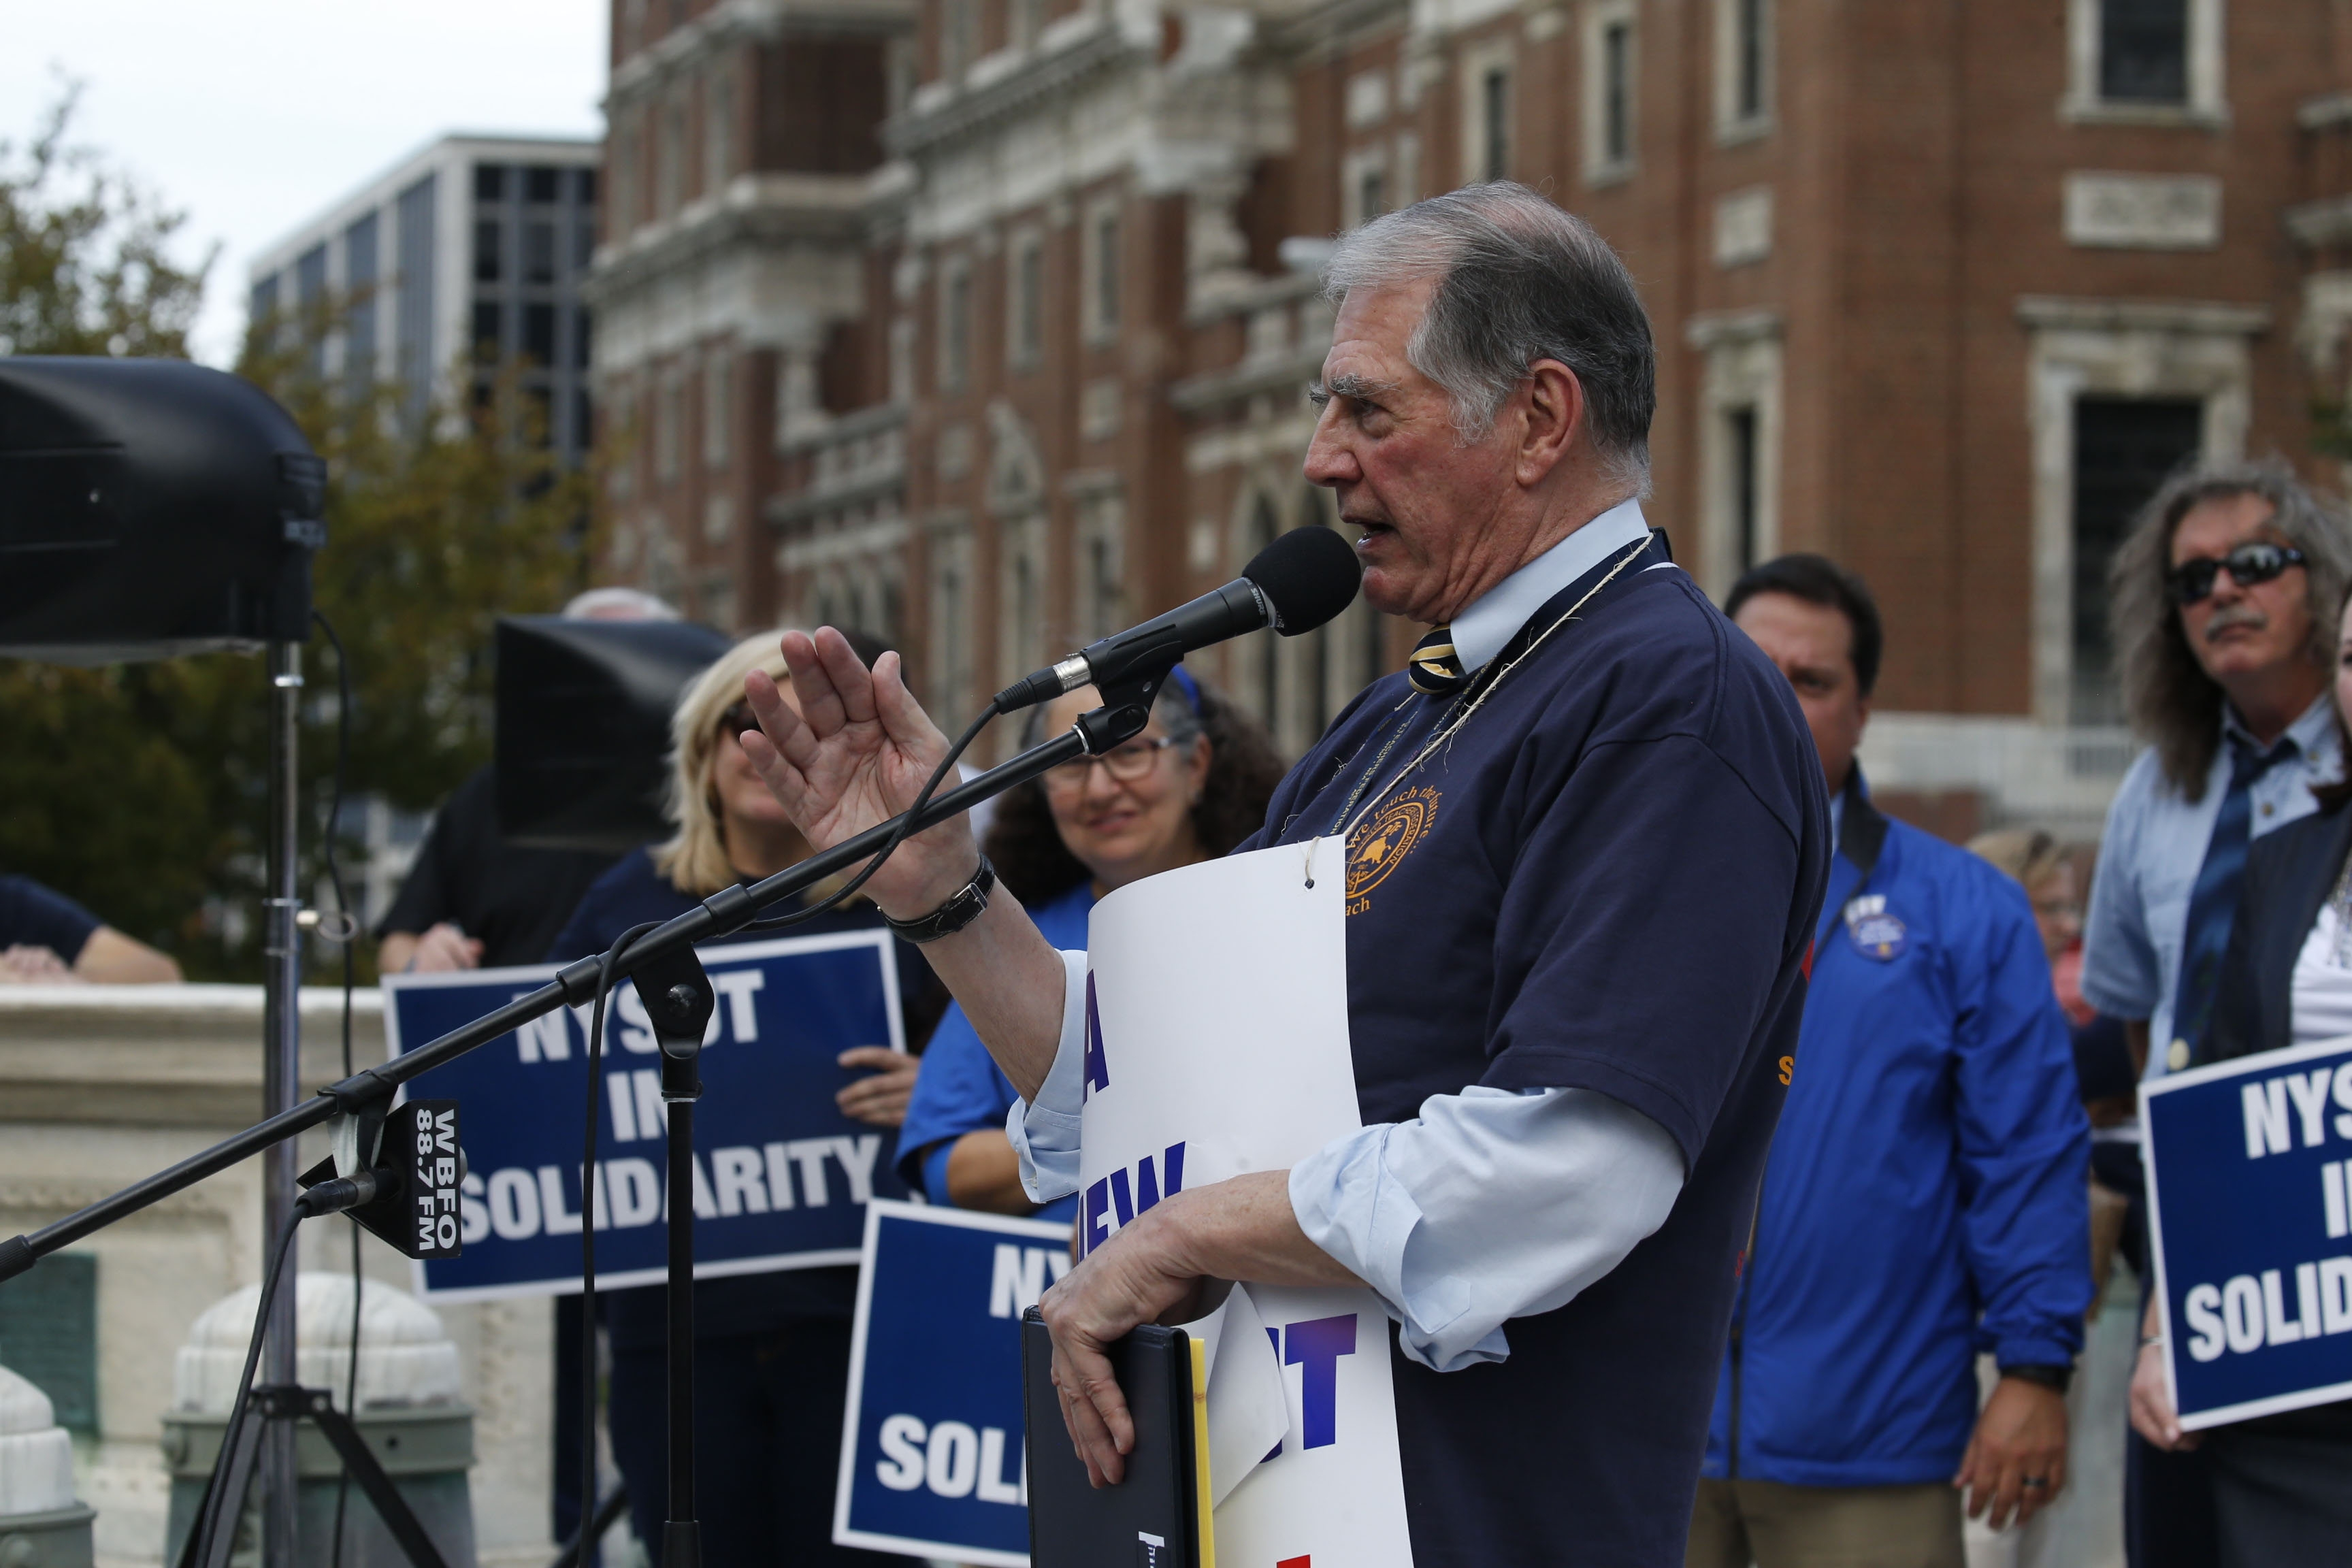 Buffalo Teachers Federation President Philip Rumore speaks at rally in Niagara Square. The union meets Oct. 17. (Robert Kirkham/Buffalo News)